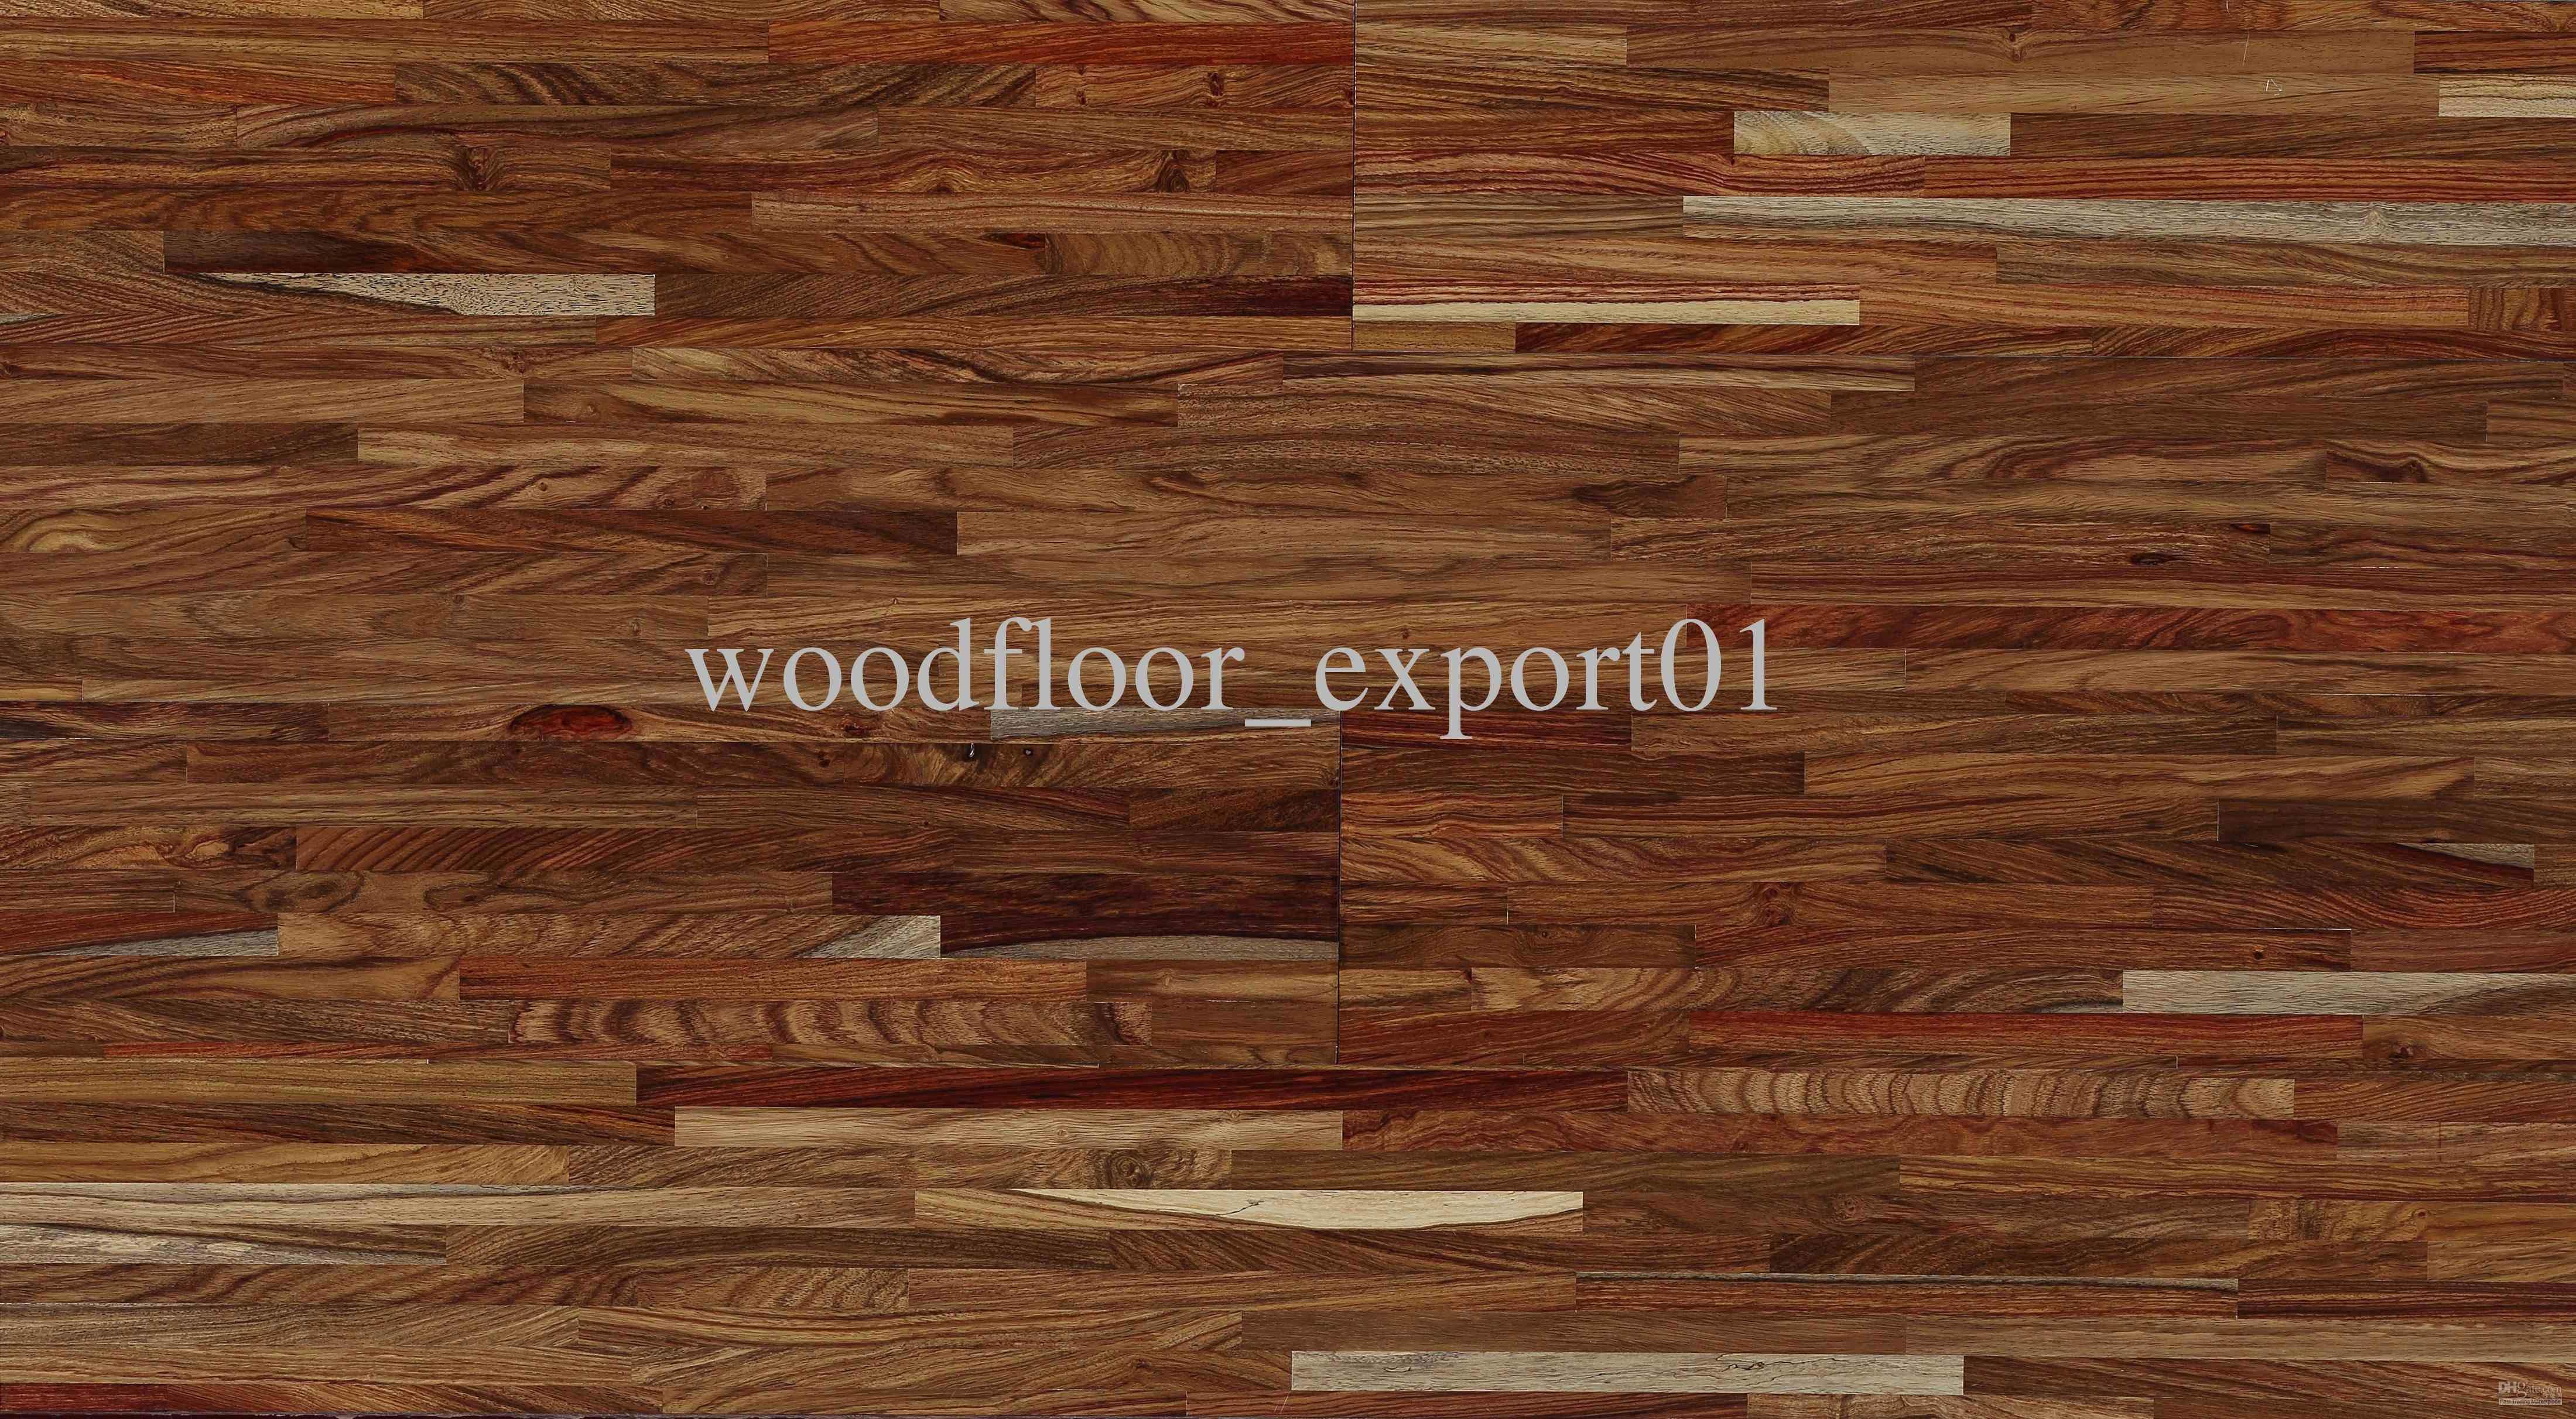 hardwood flooring houston tx of flooring supplies floor plan ideas throughout hardwood flooring houston best where to buy hardwood flooring inspirational 0d grace place barnegat